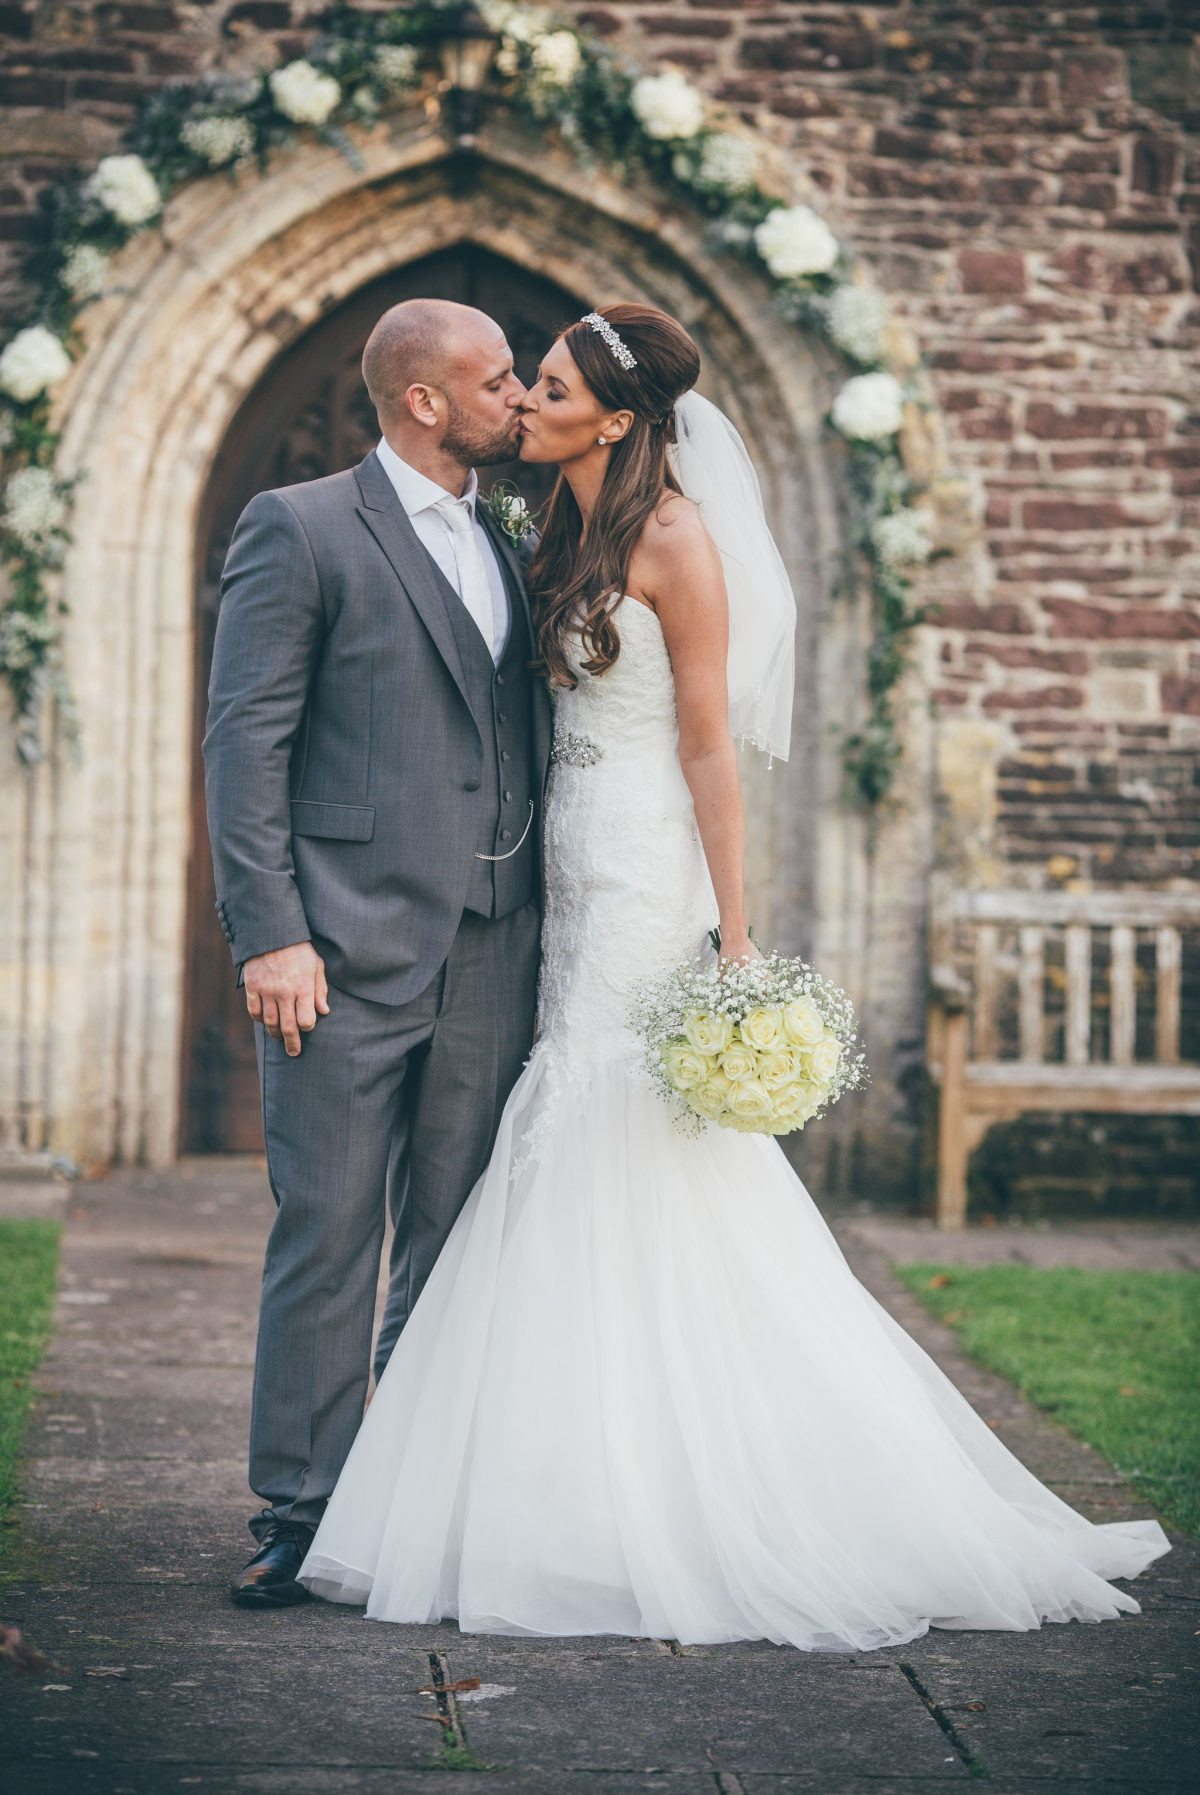 welsh_wedding_photographer_rachel_lambert_photography_decourceys_cardiff_rhiannon_gavin_ 41